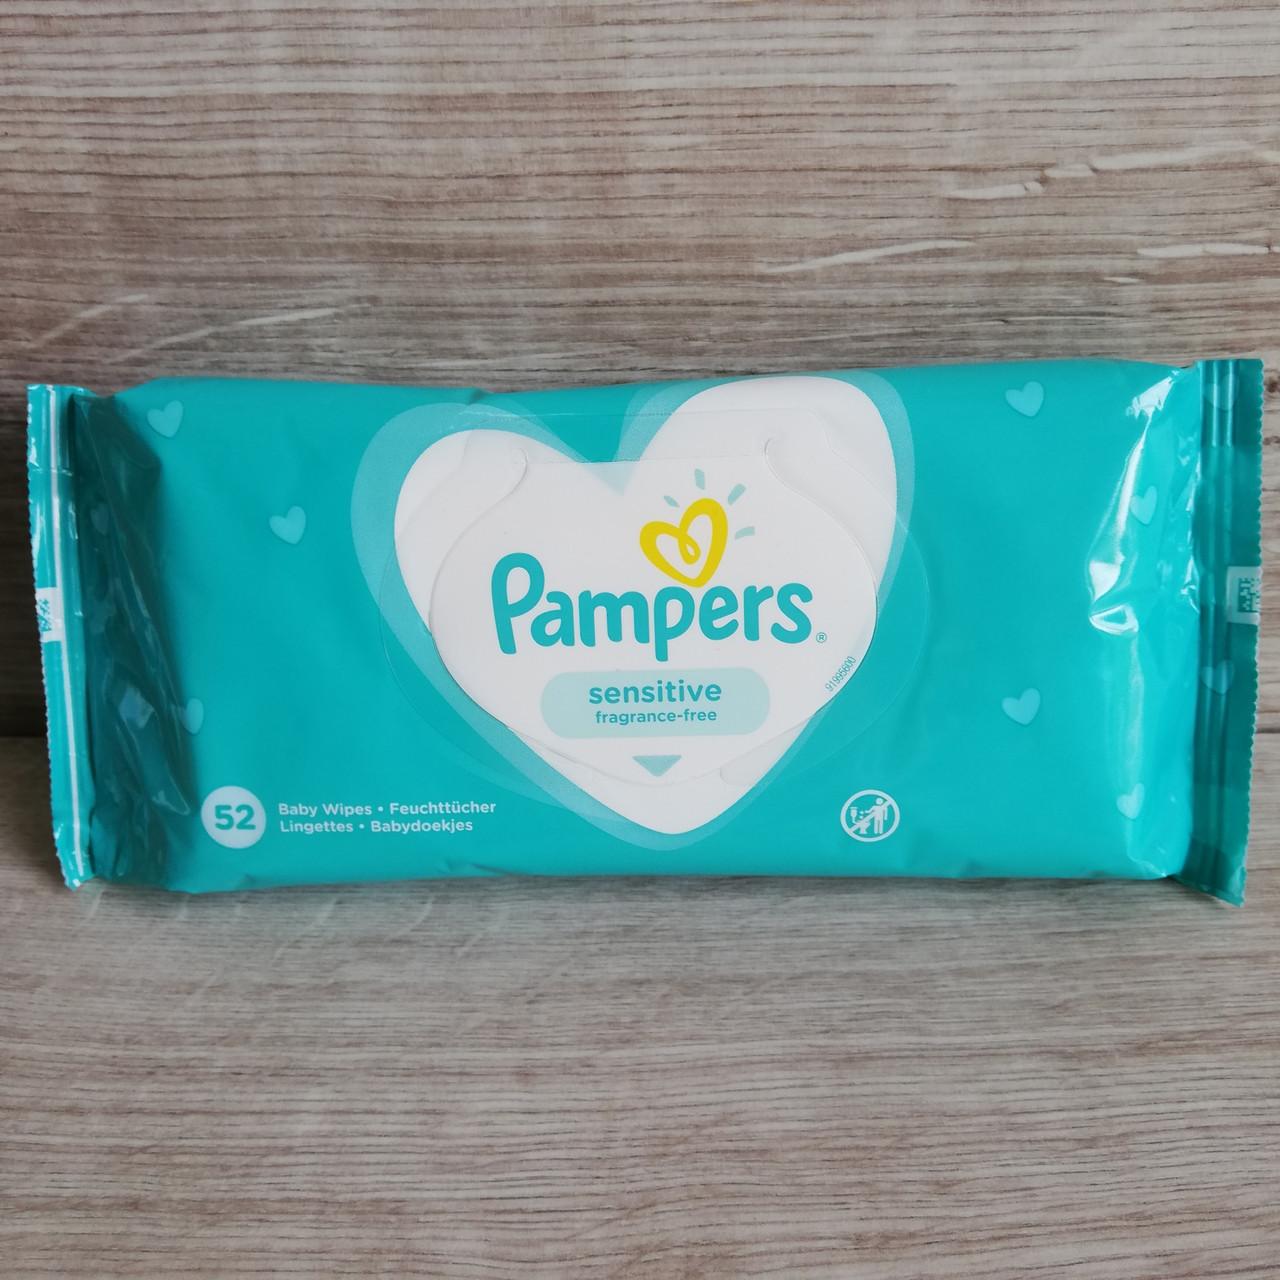 Pampers Sensitive